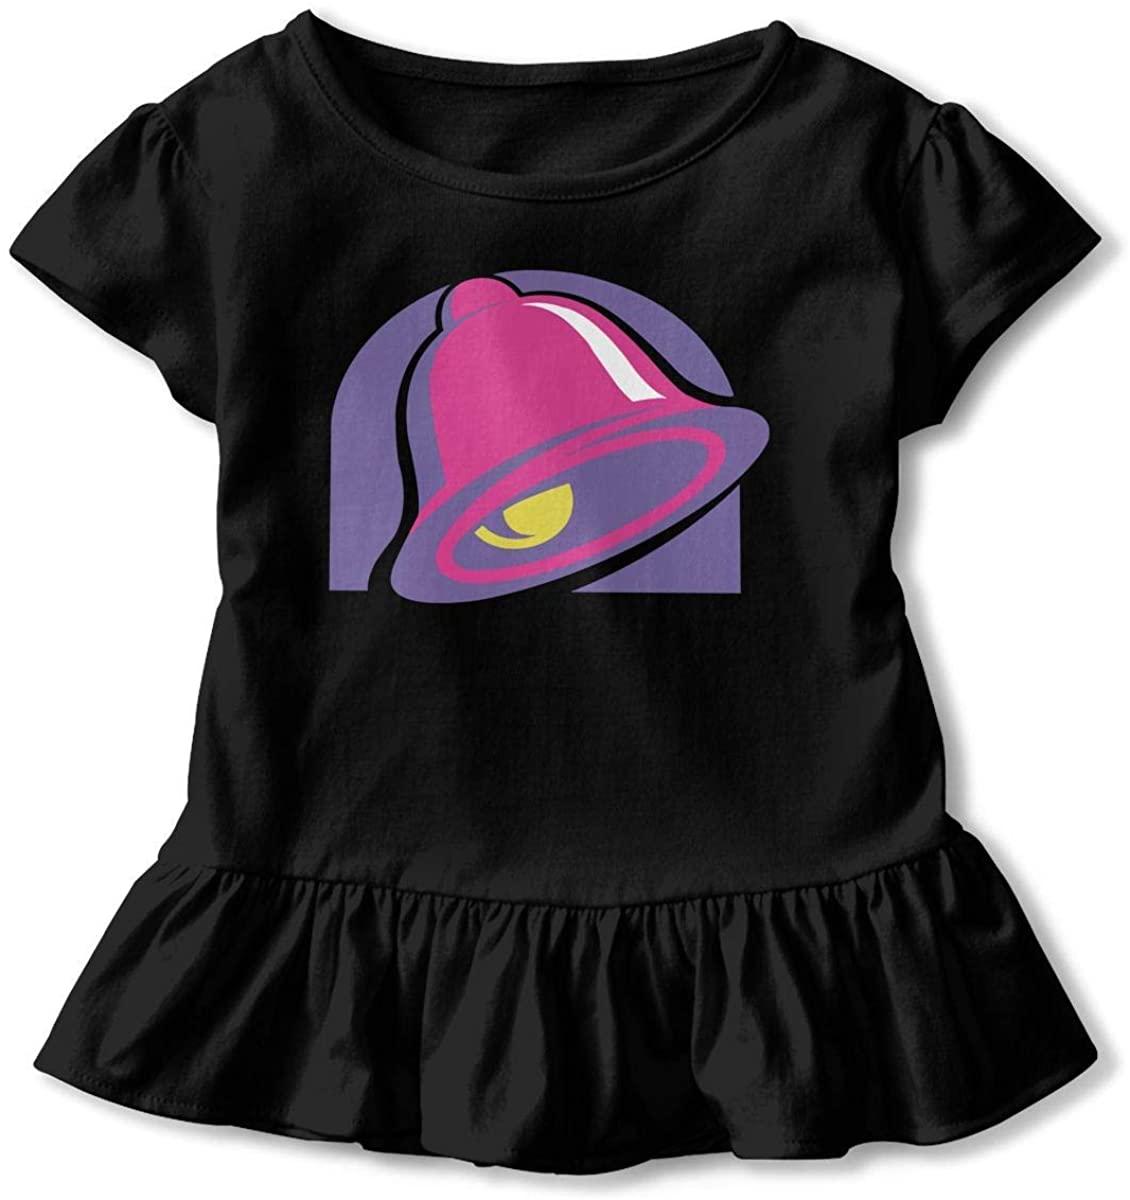 Taco Bell 2-6T Old Child Girls Baseball Ruffle Short Sleeve Cotton T Shirt Top